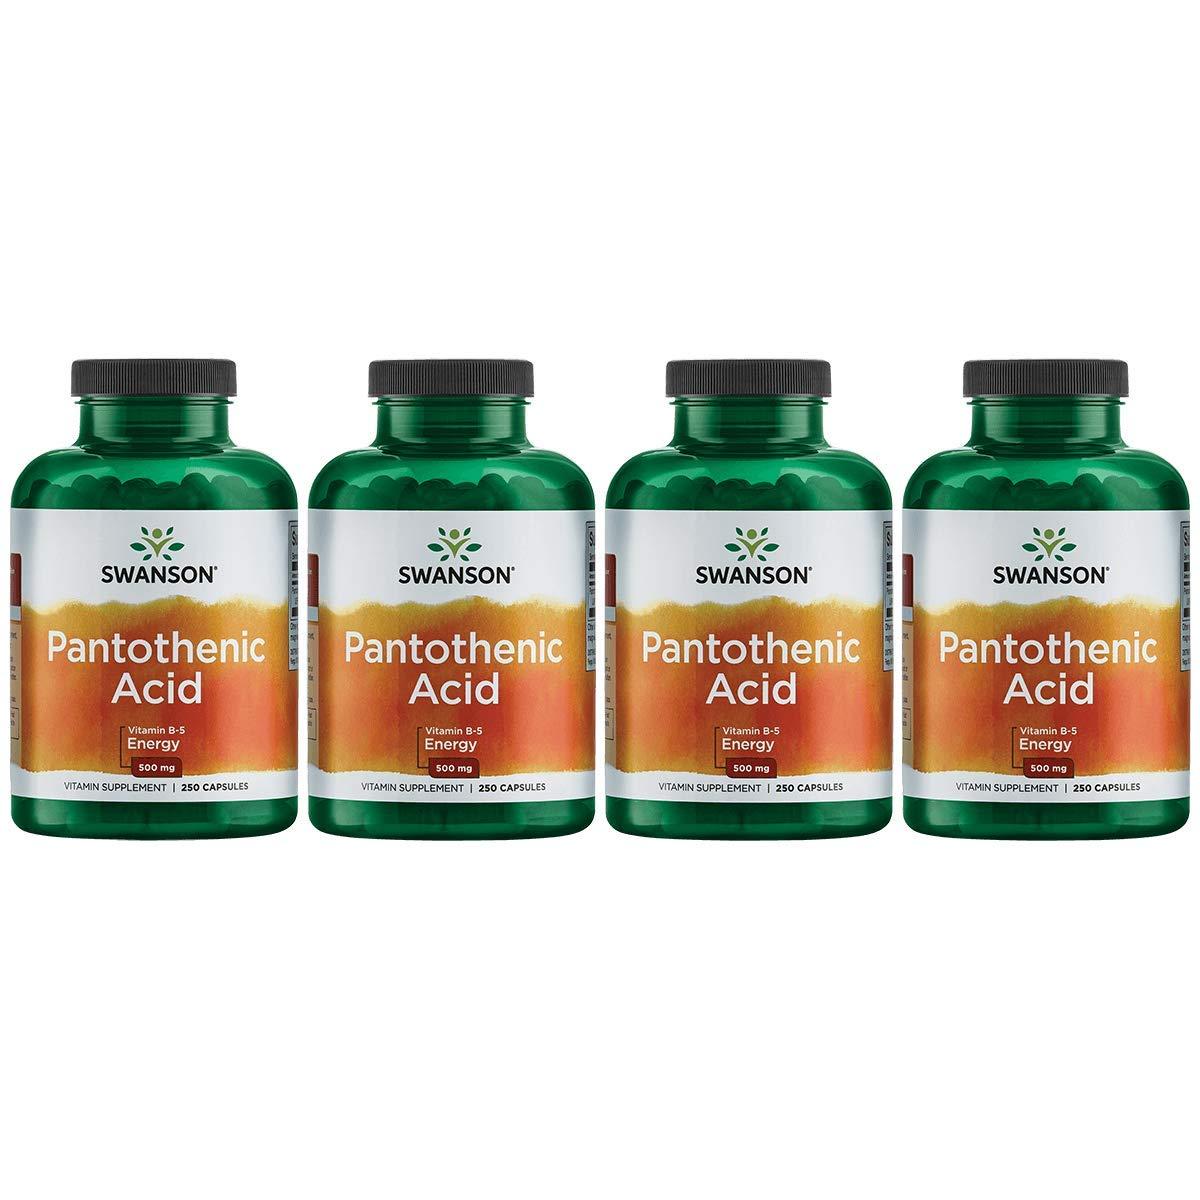 Swanson Pantothenic Acid (Vitamin B-5) Energy Metabolism Nerve Function Support 500 mg 250 Capsules (Caps) (4 Pack)